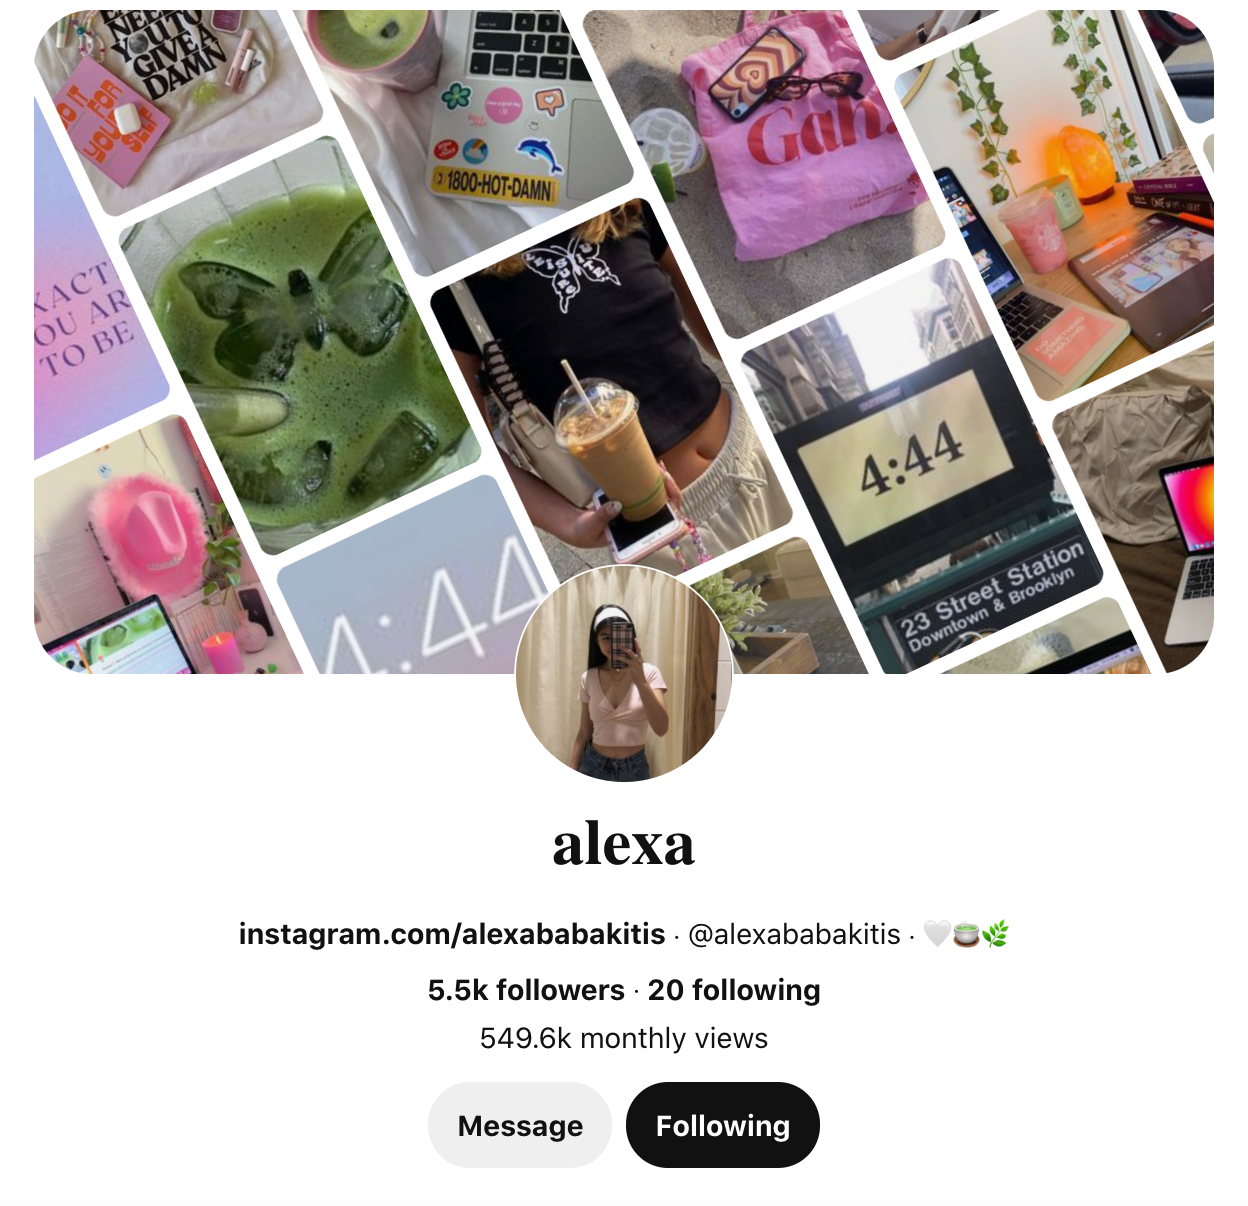 Alexa Babakitis' Pinterest page